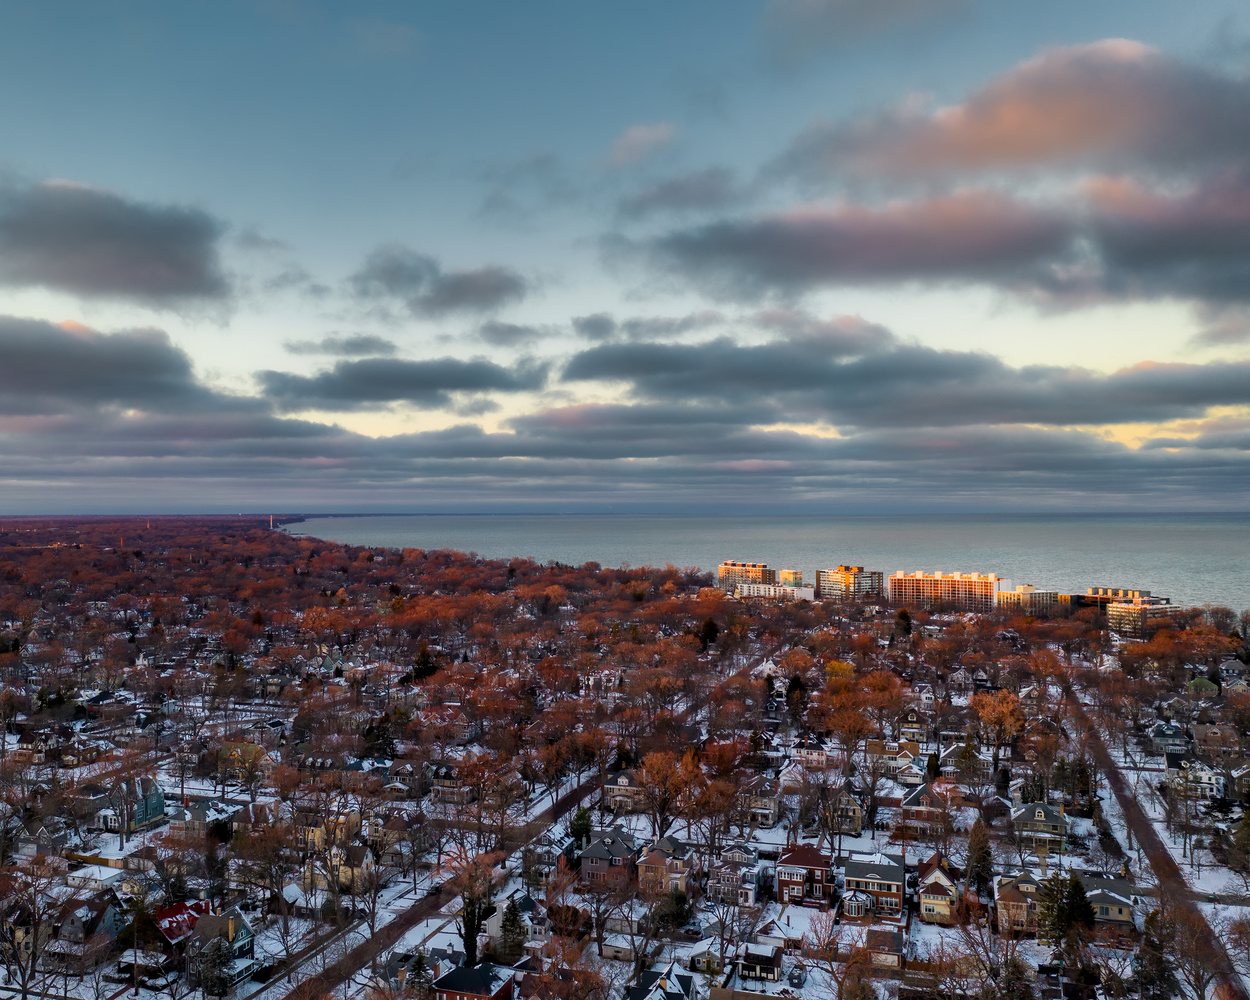 Drone shots by Skyler Ewing